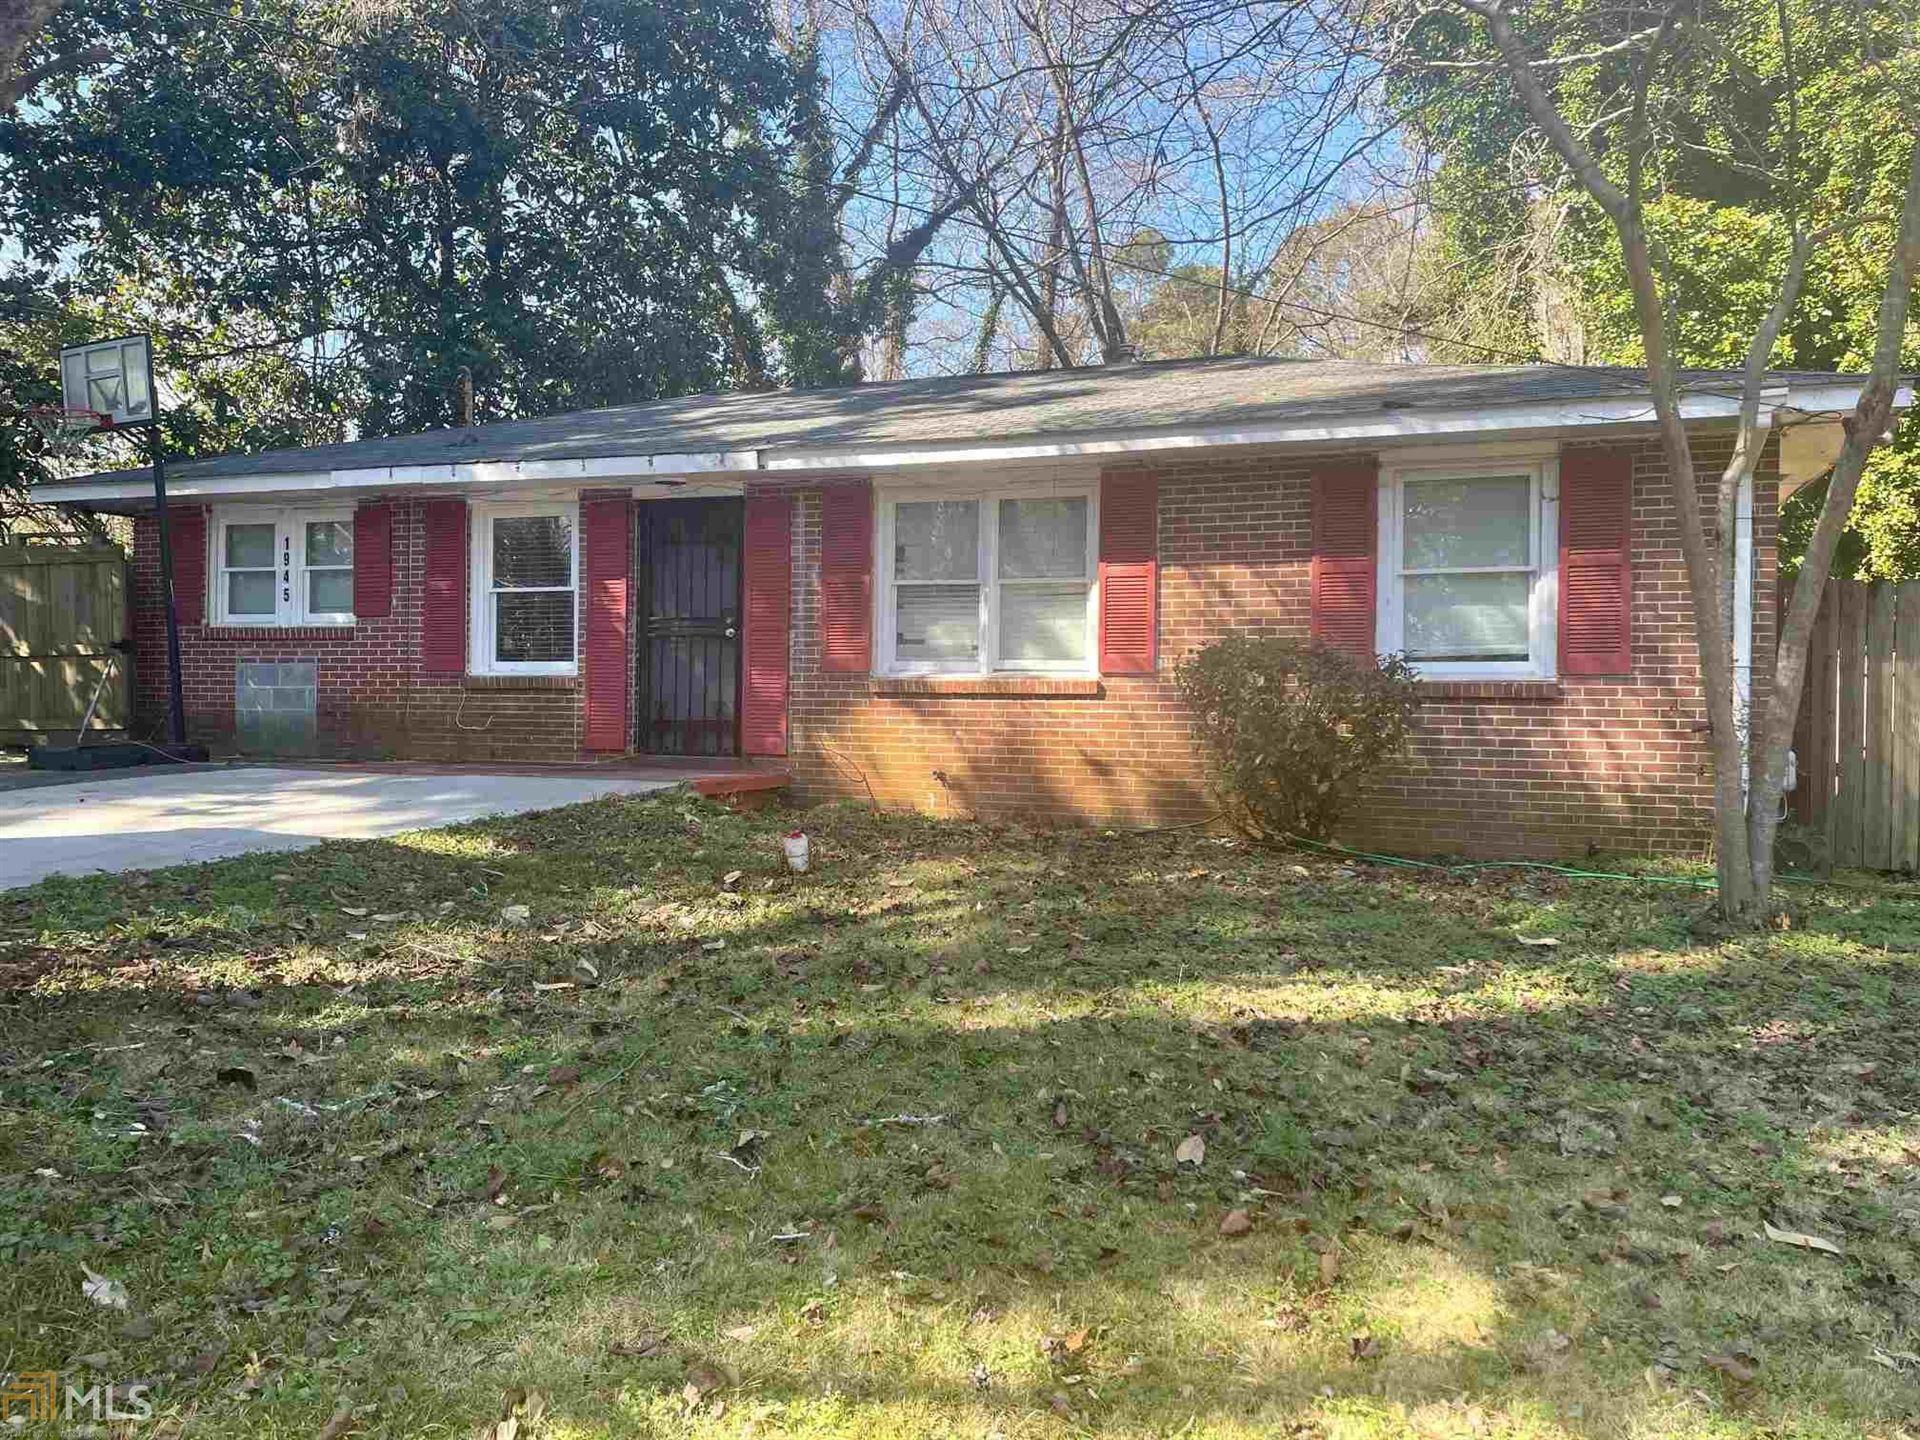 1945 Kimberly Rd, Atlanta, GA 30331 - MLS#: 8918929